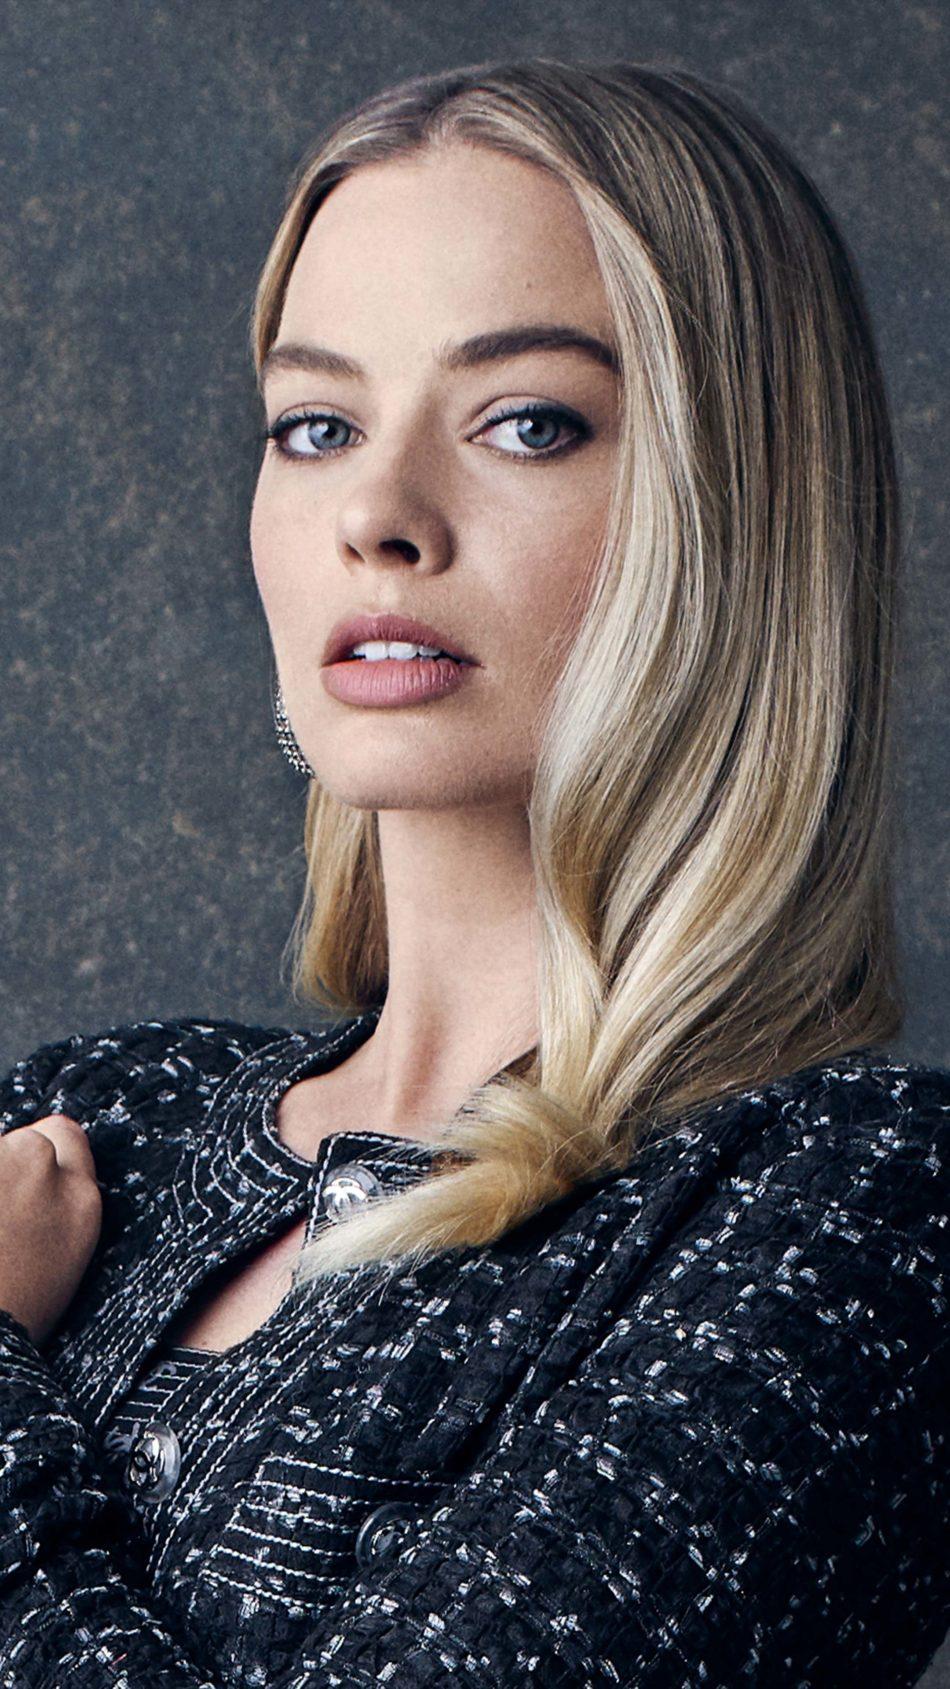 Australian Actress Margot Robbie 2020 4K Ultra HD Mobile Wallpaper